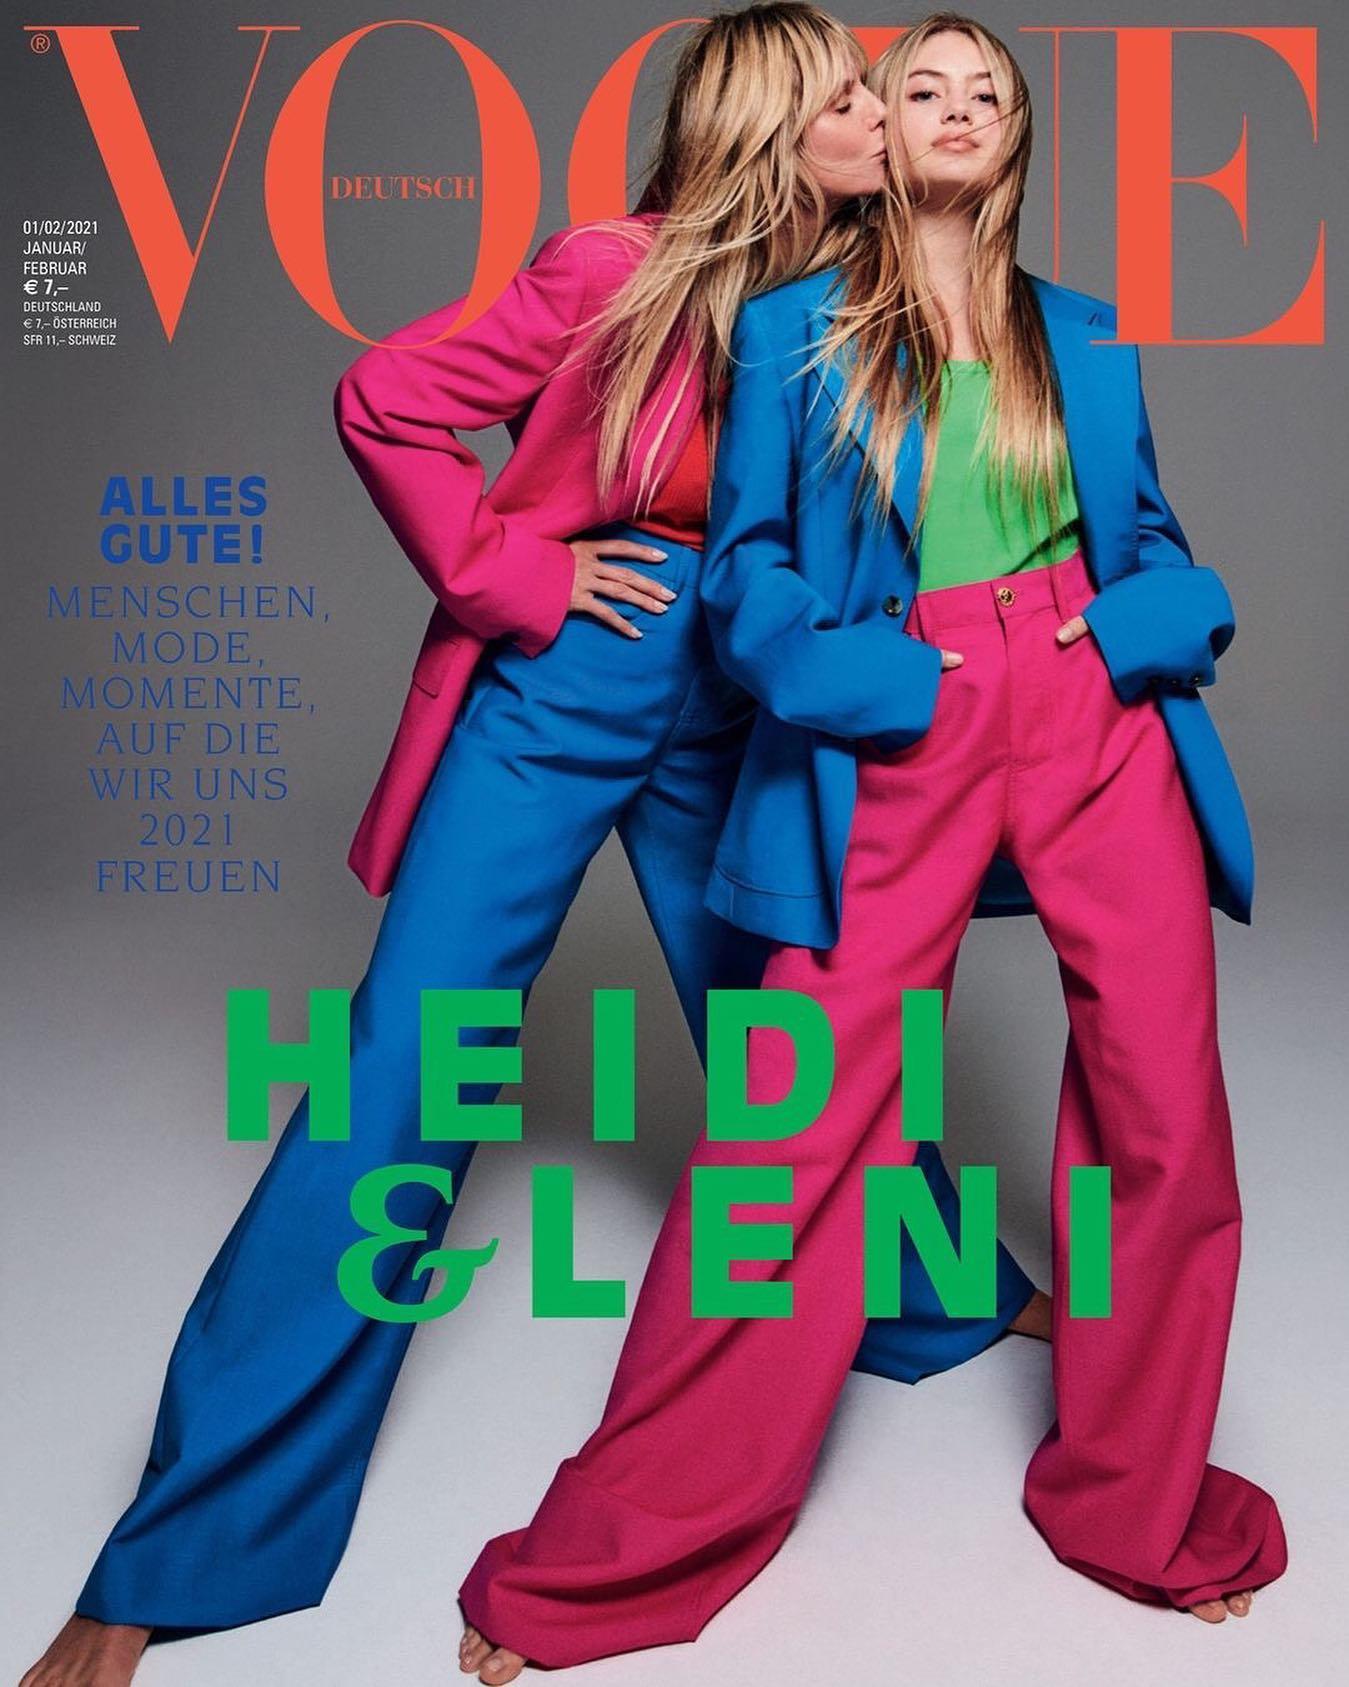 Heidi Klum & Leni Klum for Vogue Germany January 2021